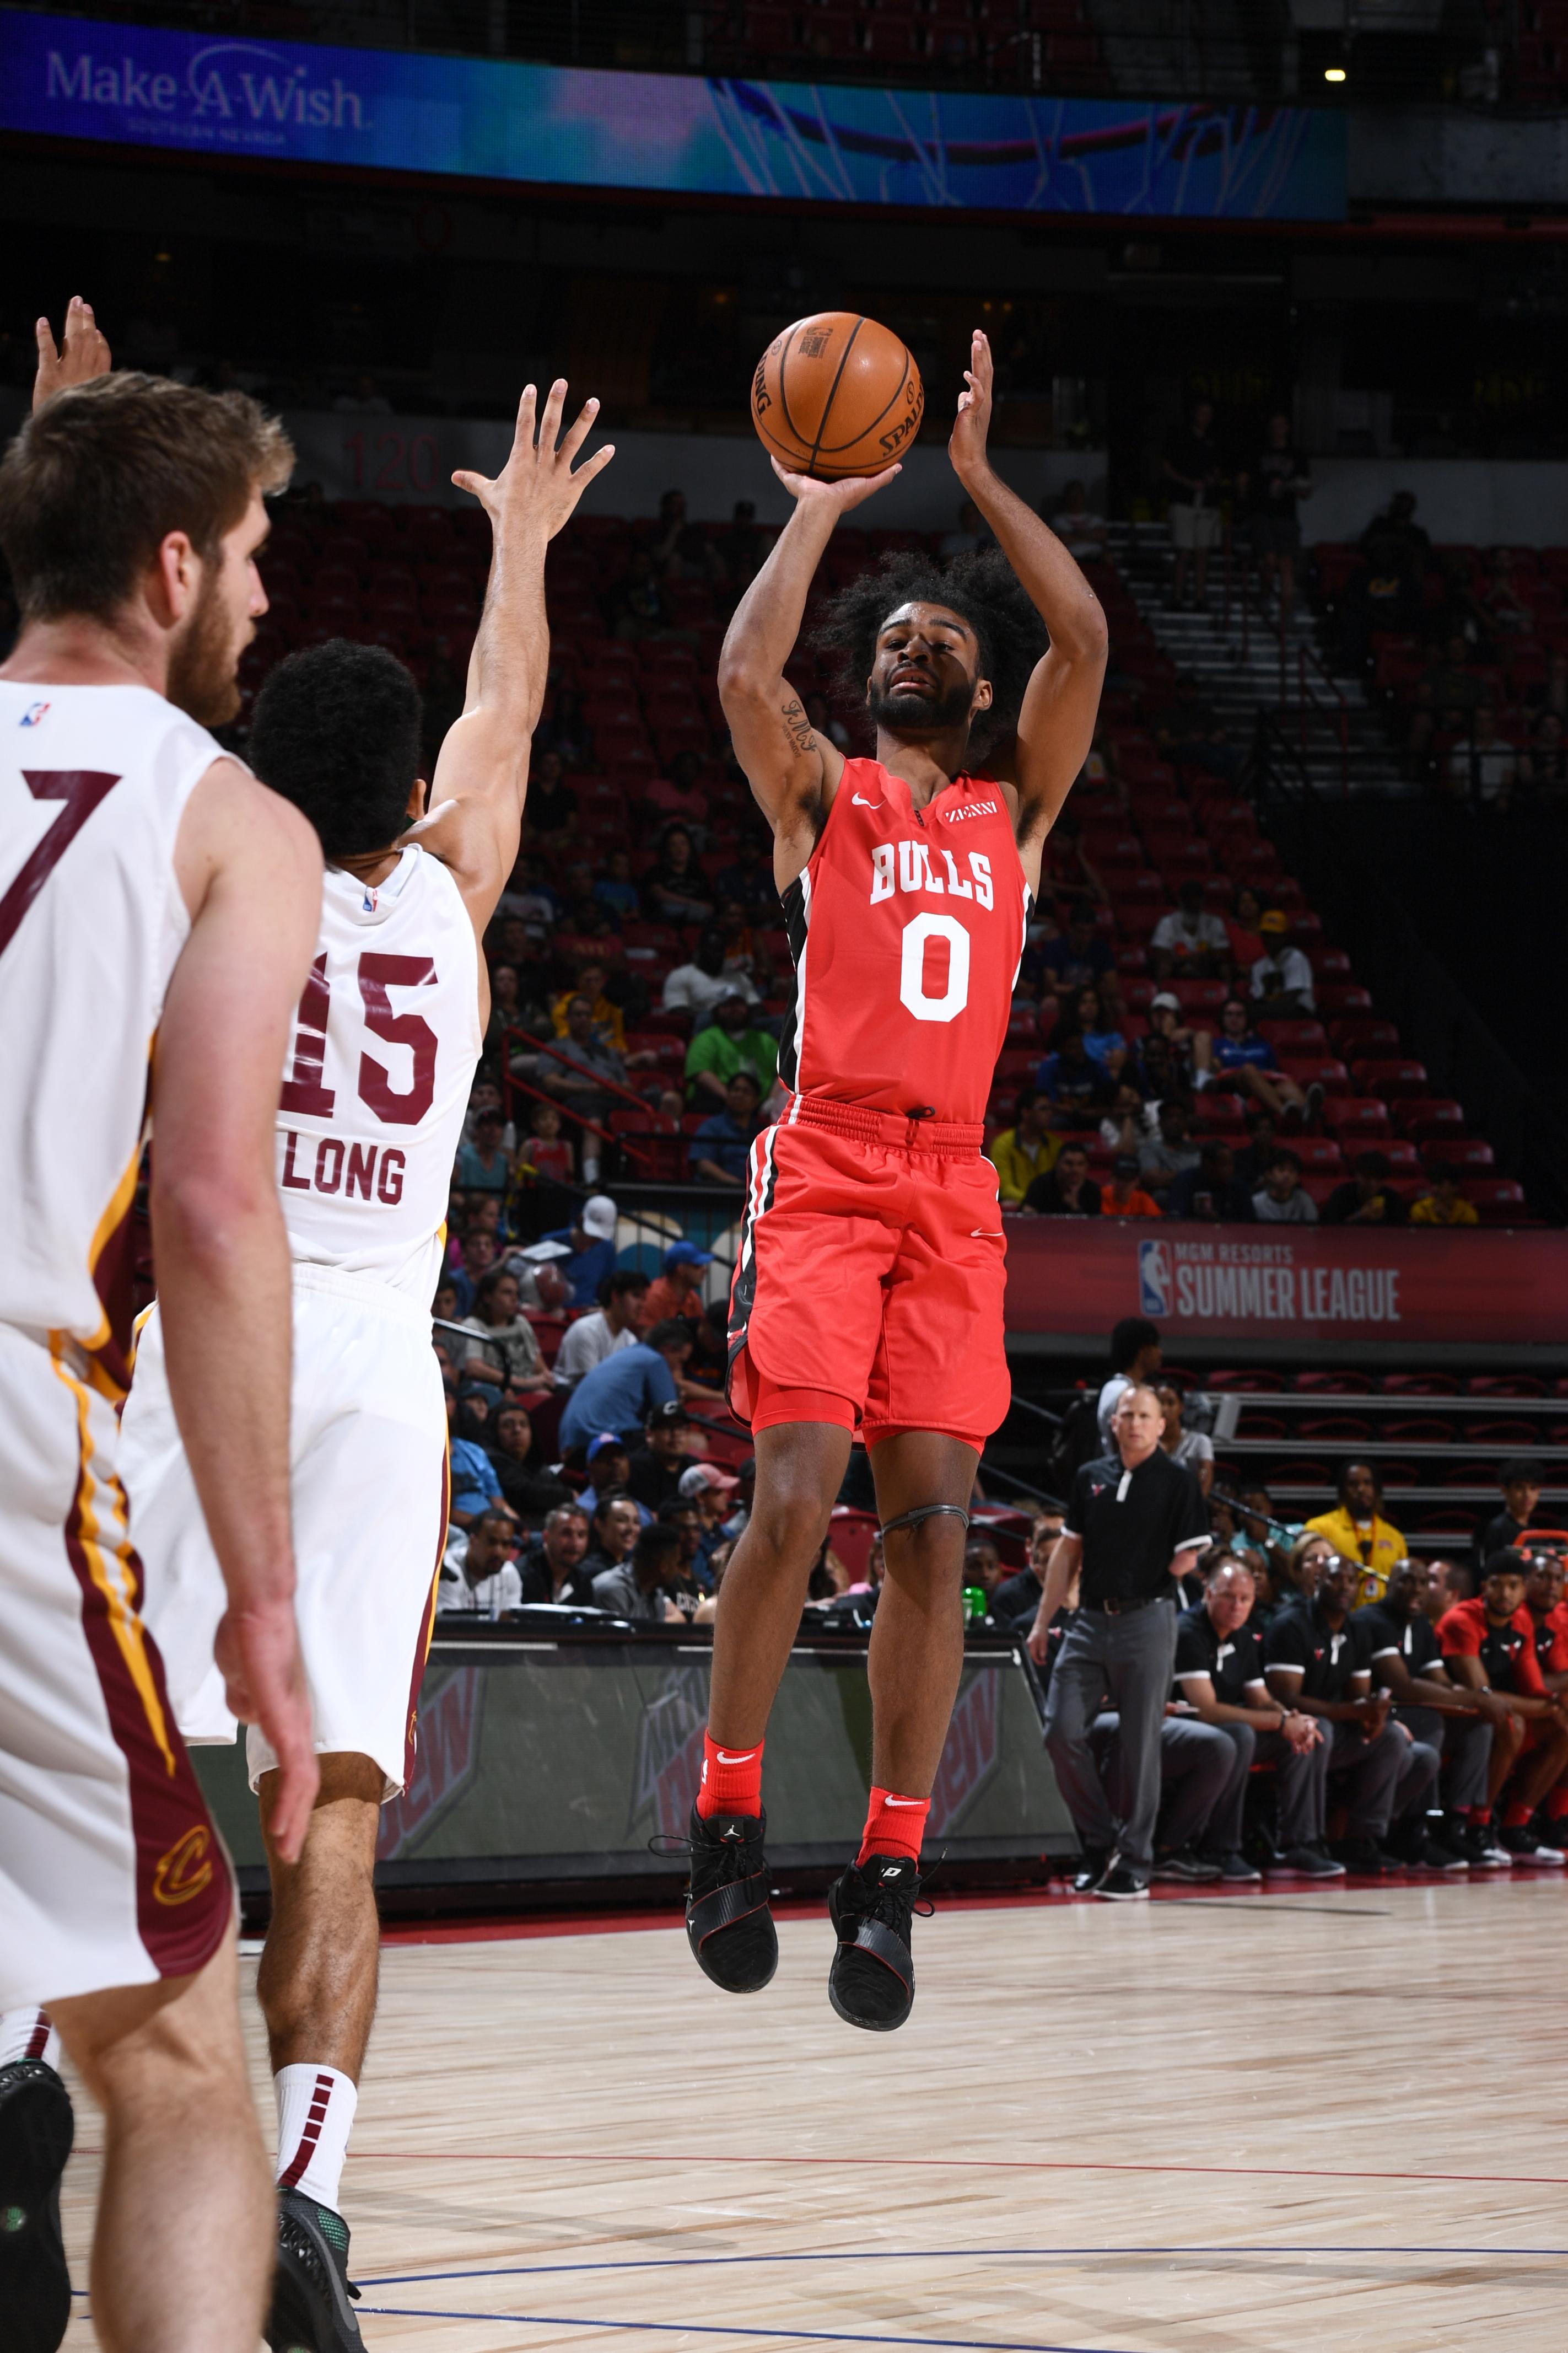 2019 Las Vegas Summer League - Day 3 - Chicago Bulls v Cleveland Cavaliers